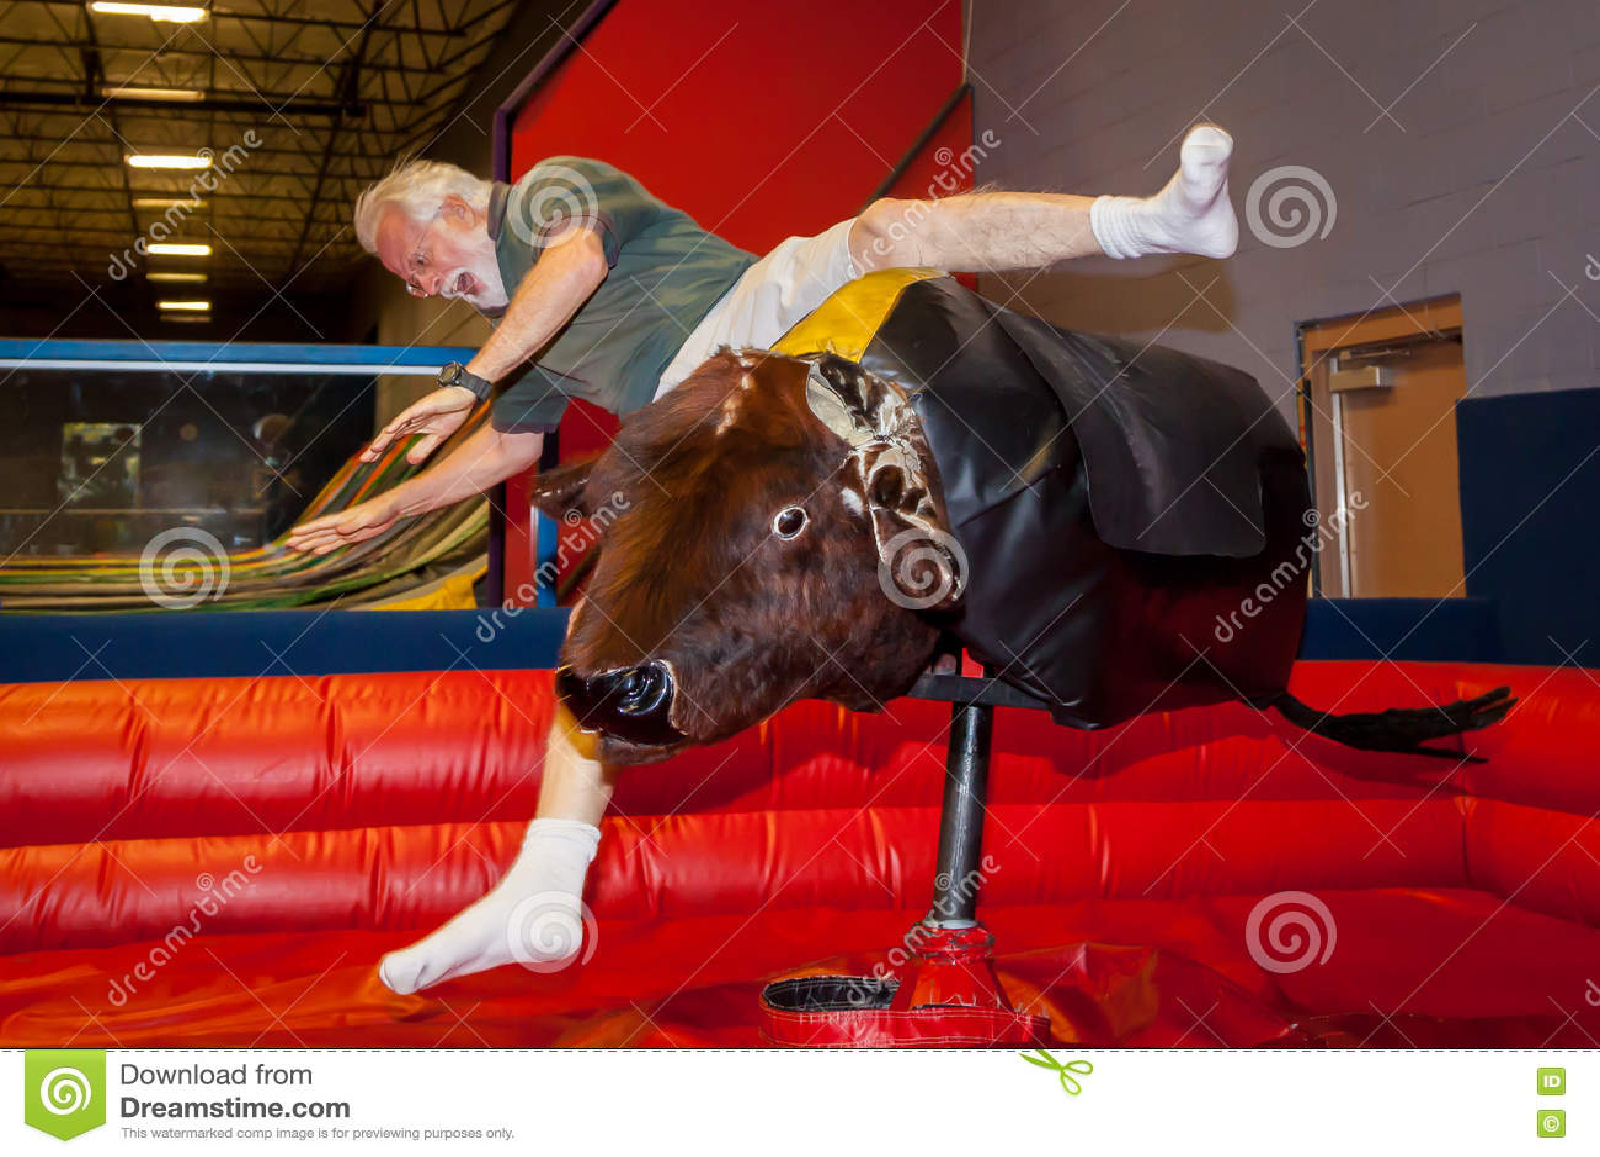 senior man falls off mechanical bull stock image